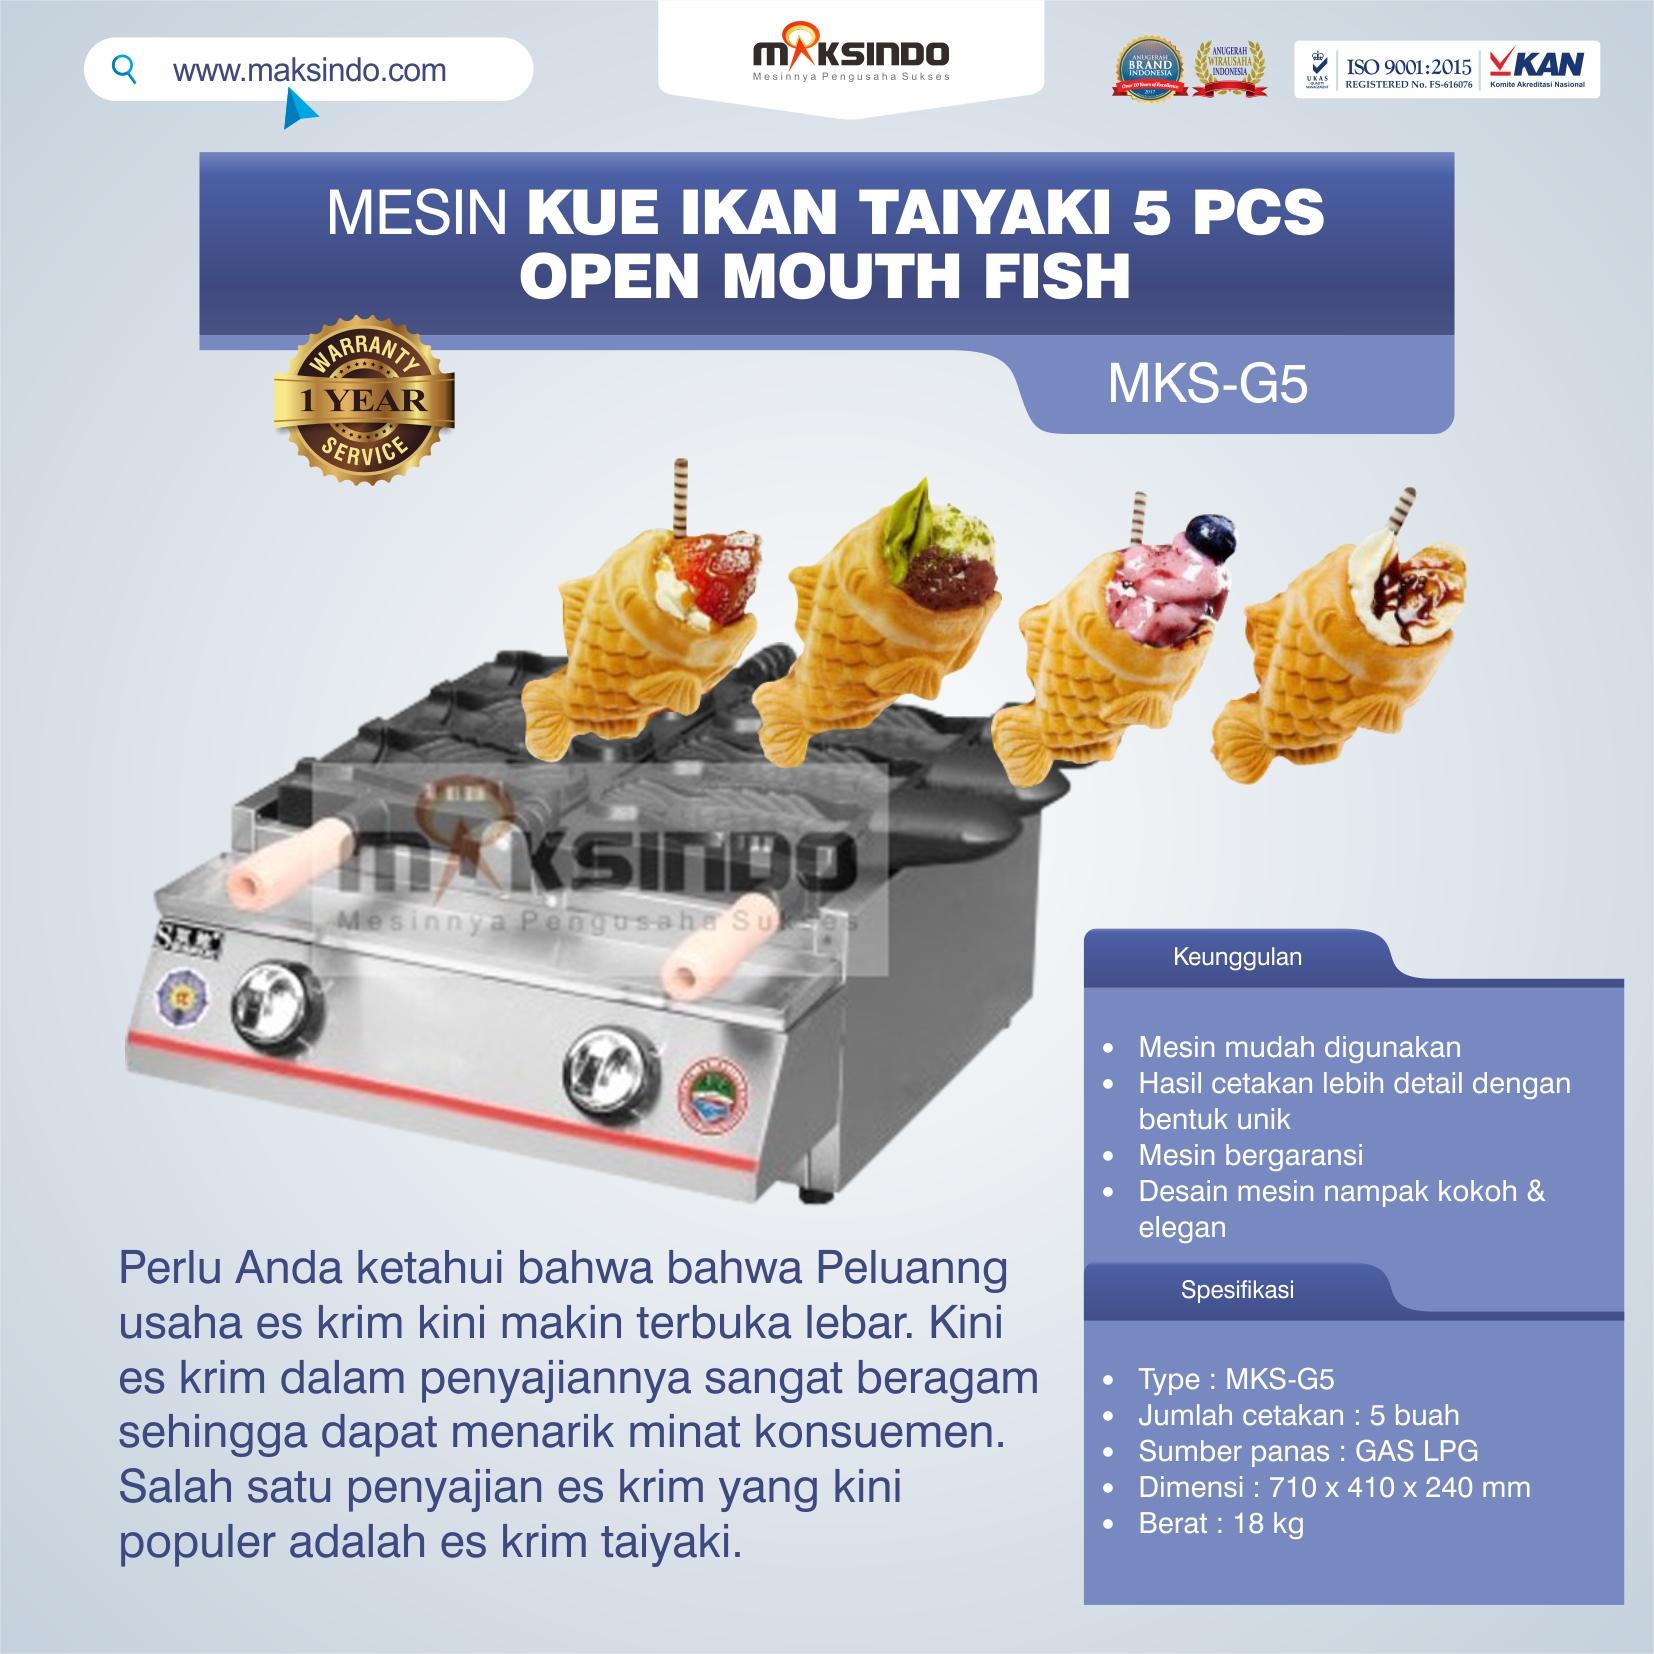 Jual Mesin Kue Ikan Taiyaki 5 Pcs – Open Mouth Fish di Solo